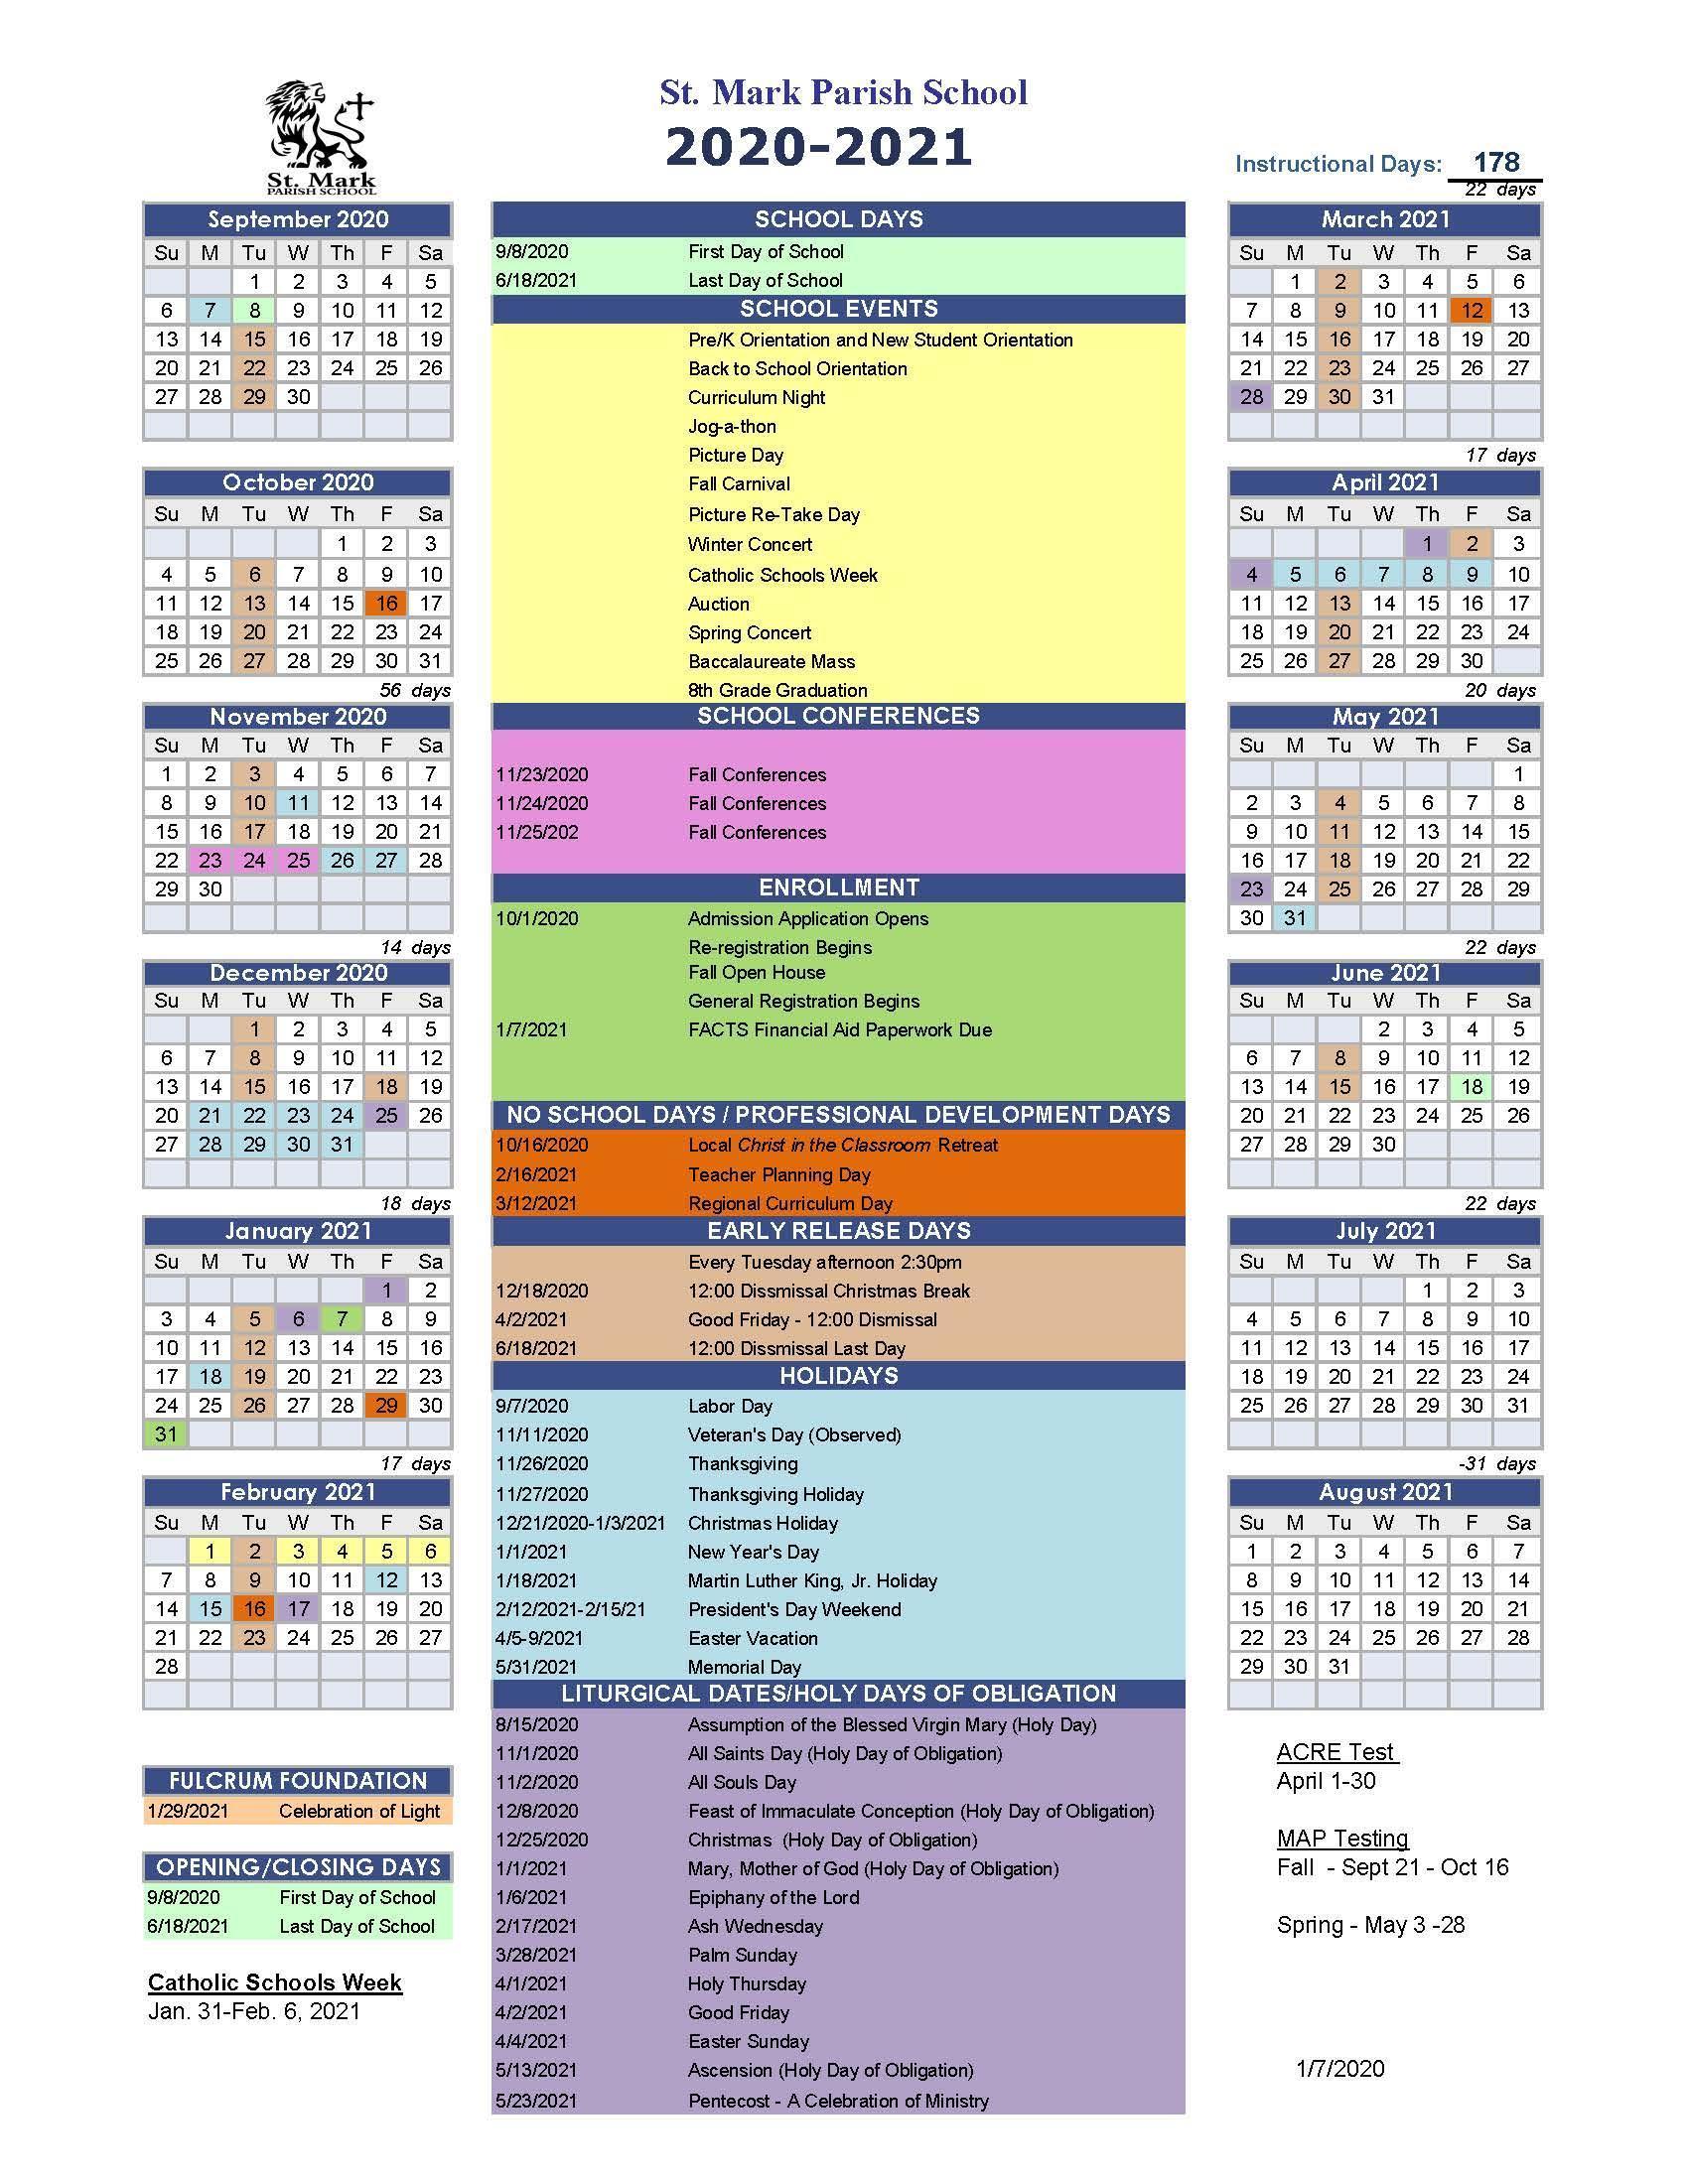 Seattle Schools Calendar 2021